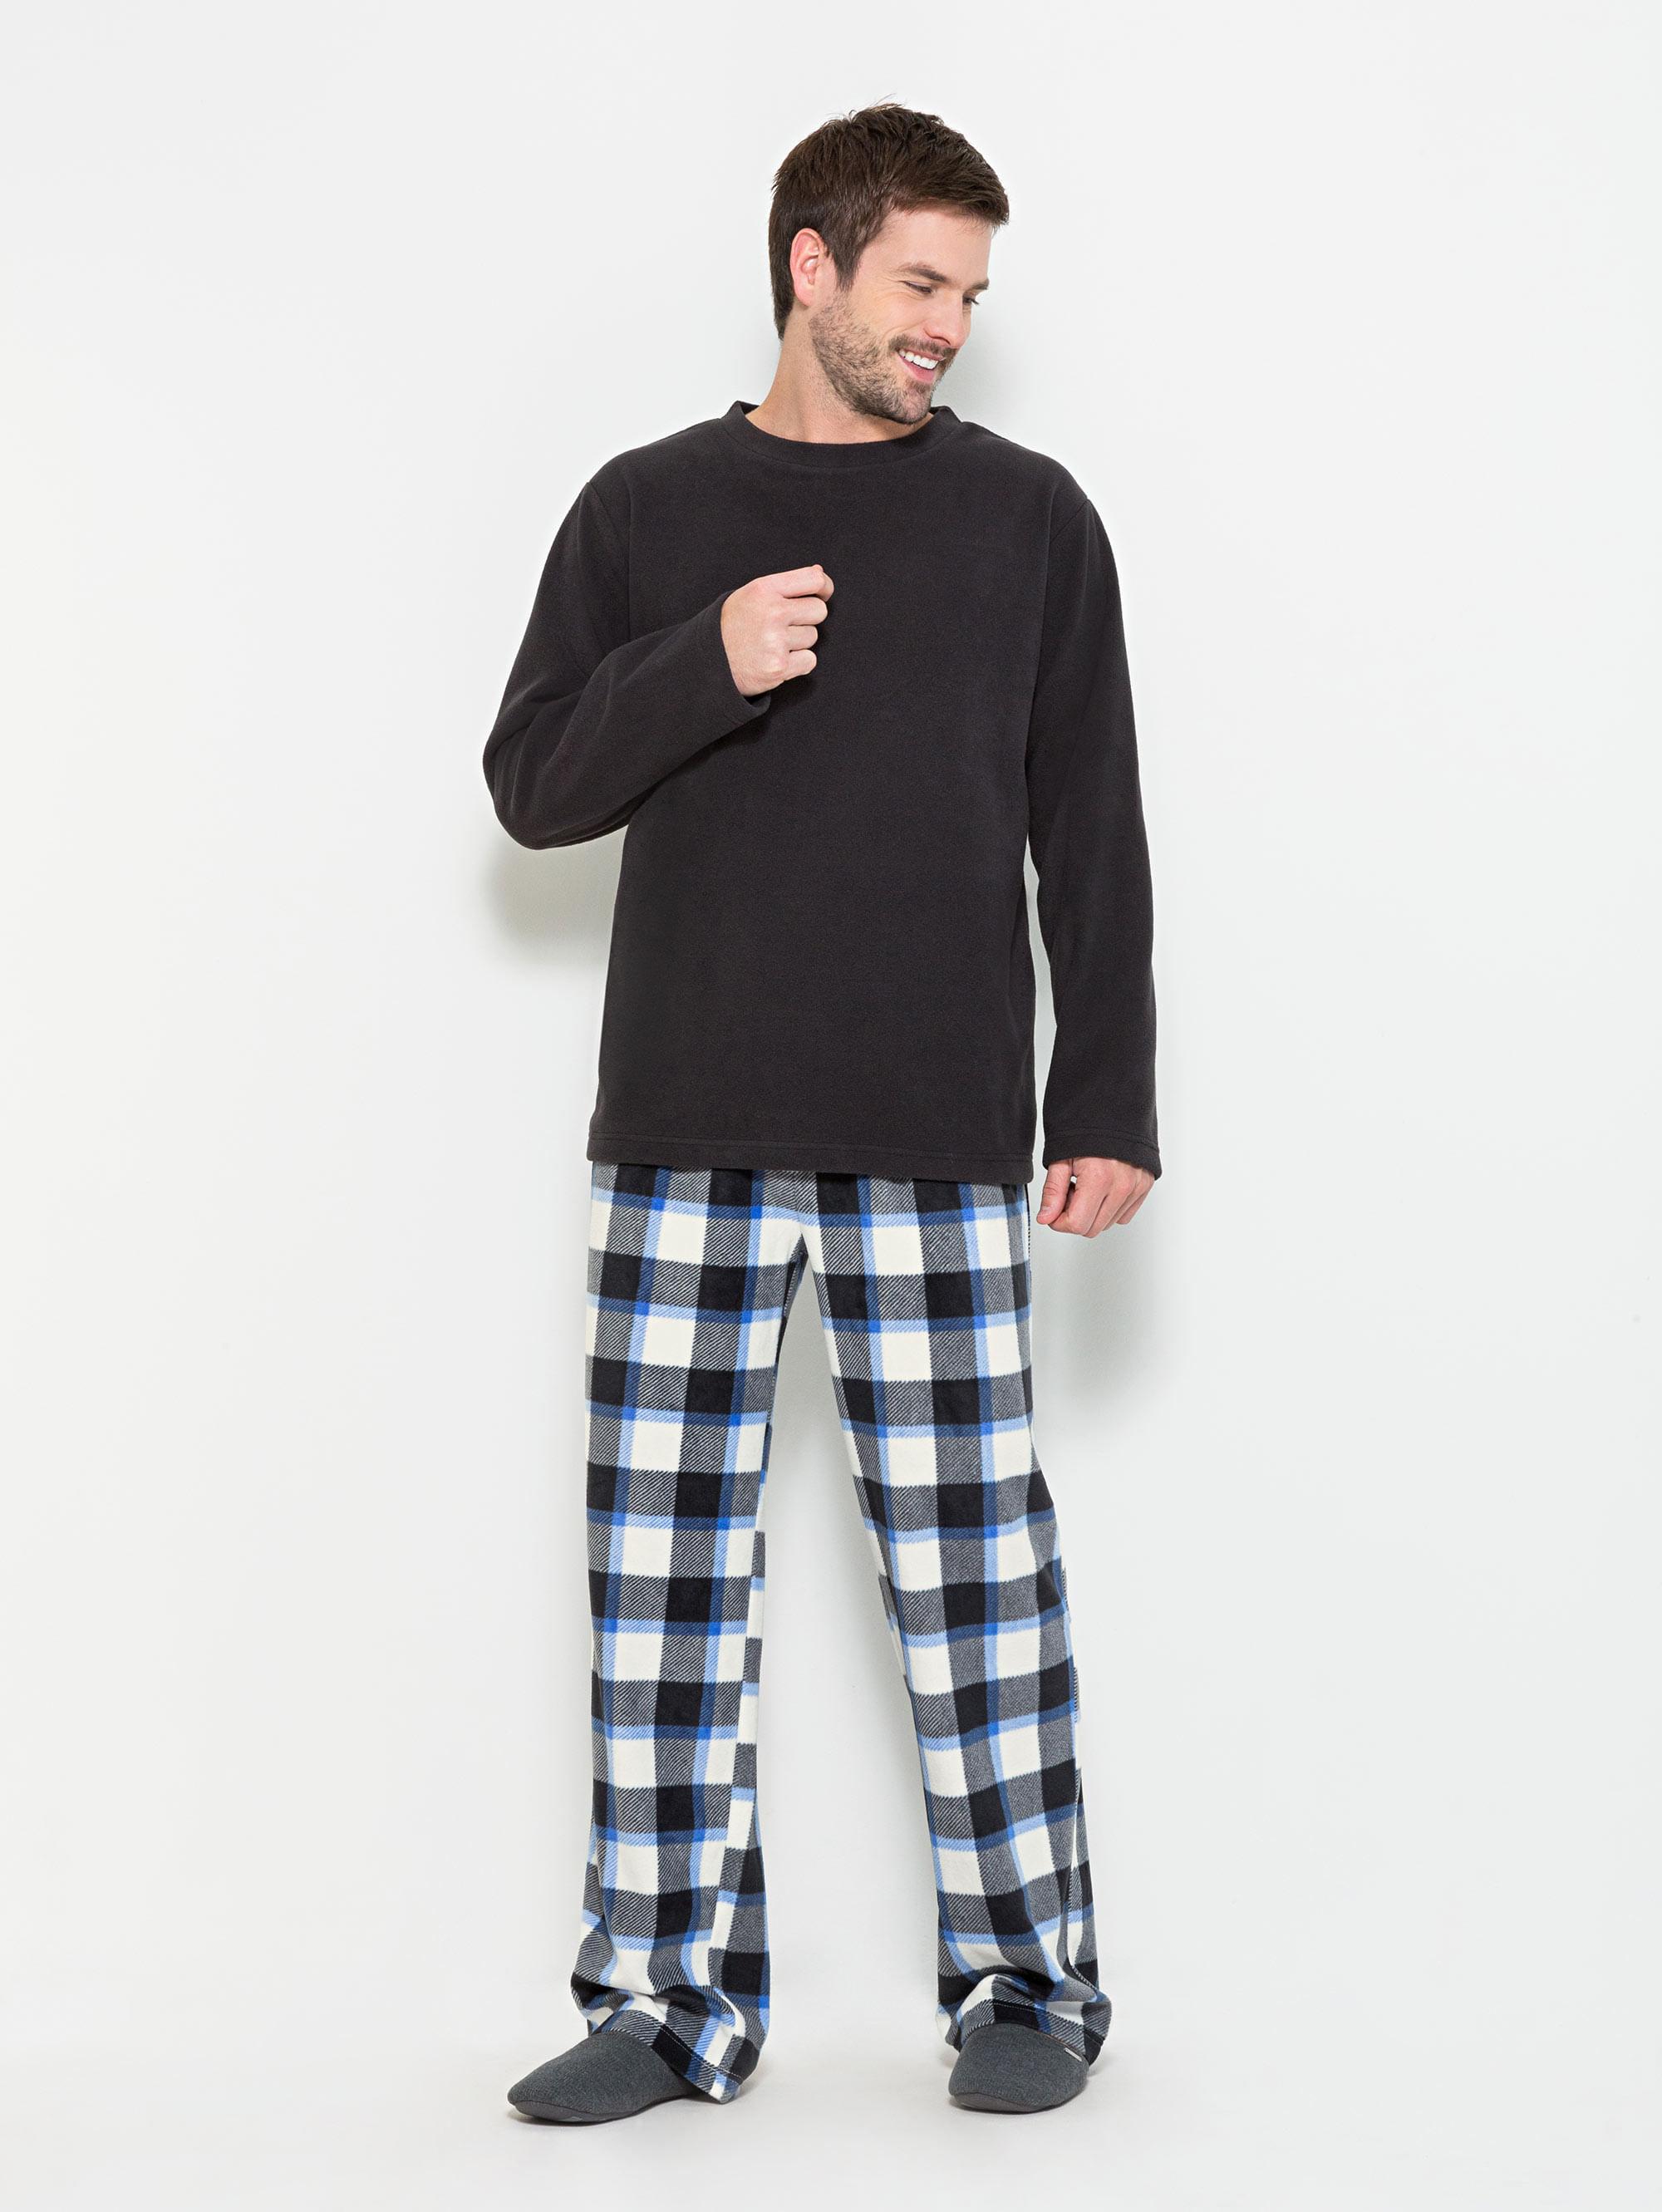 Pijama-Longo-Manga-Longa-Soft-Masculino-Rio-04.01.1533